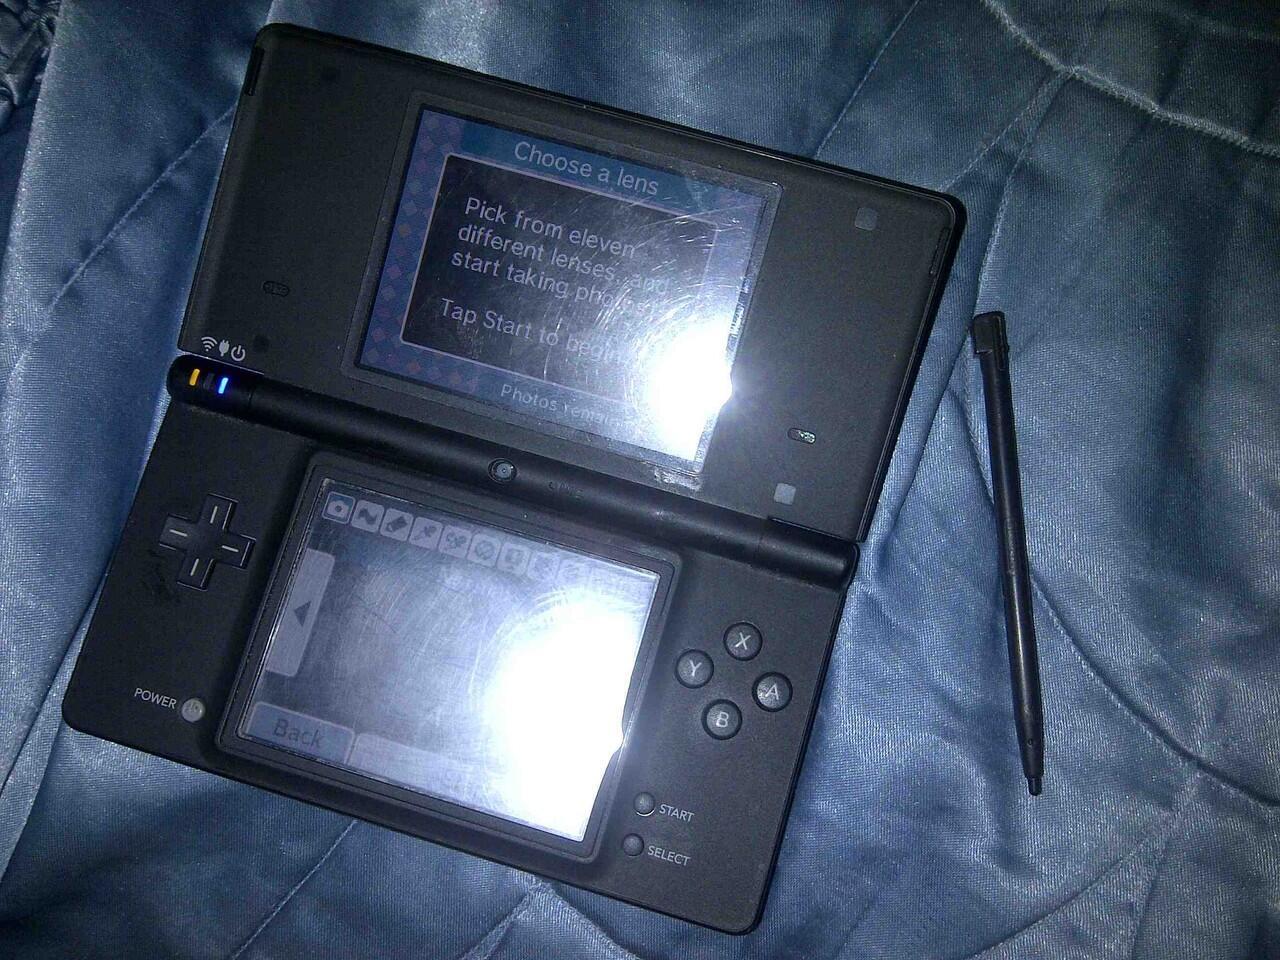 jual nintendo DSi with camera warna hitam black